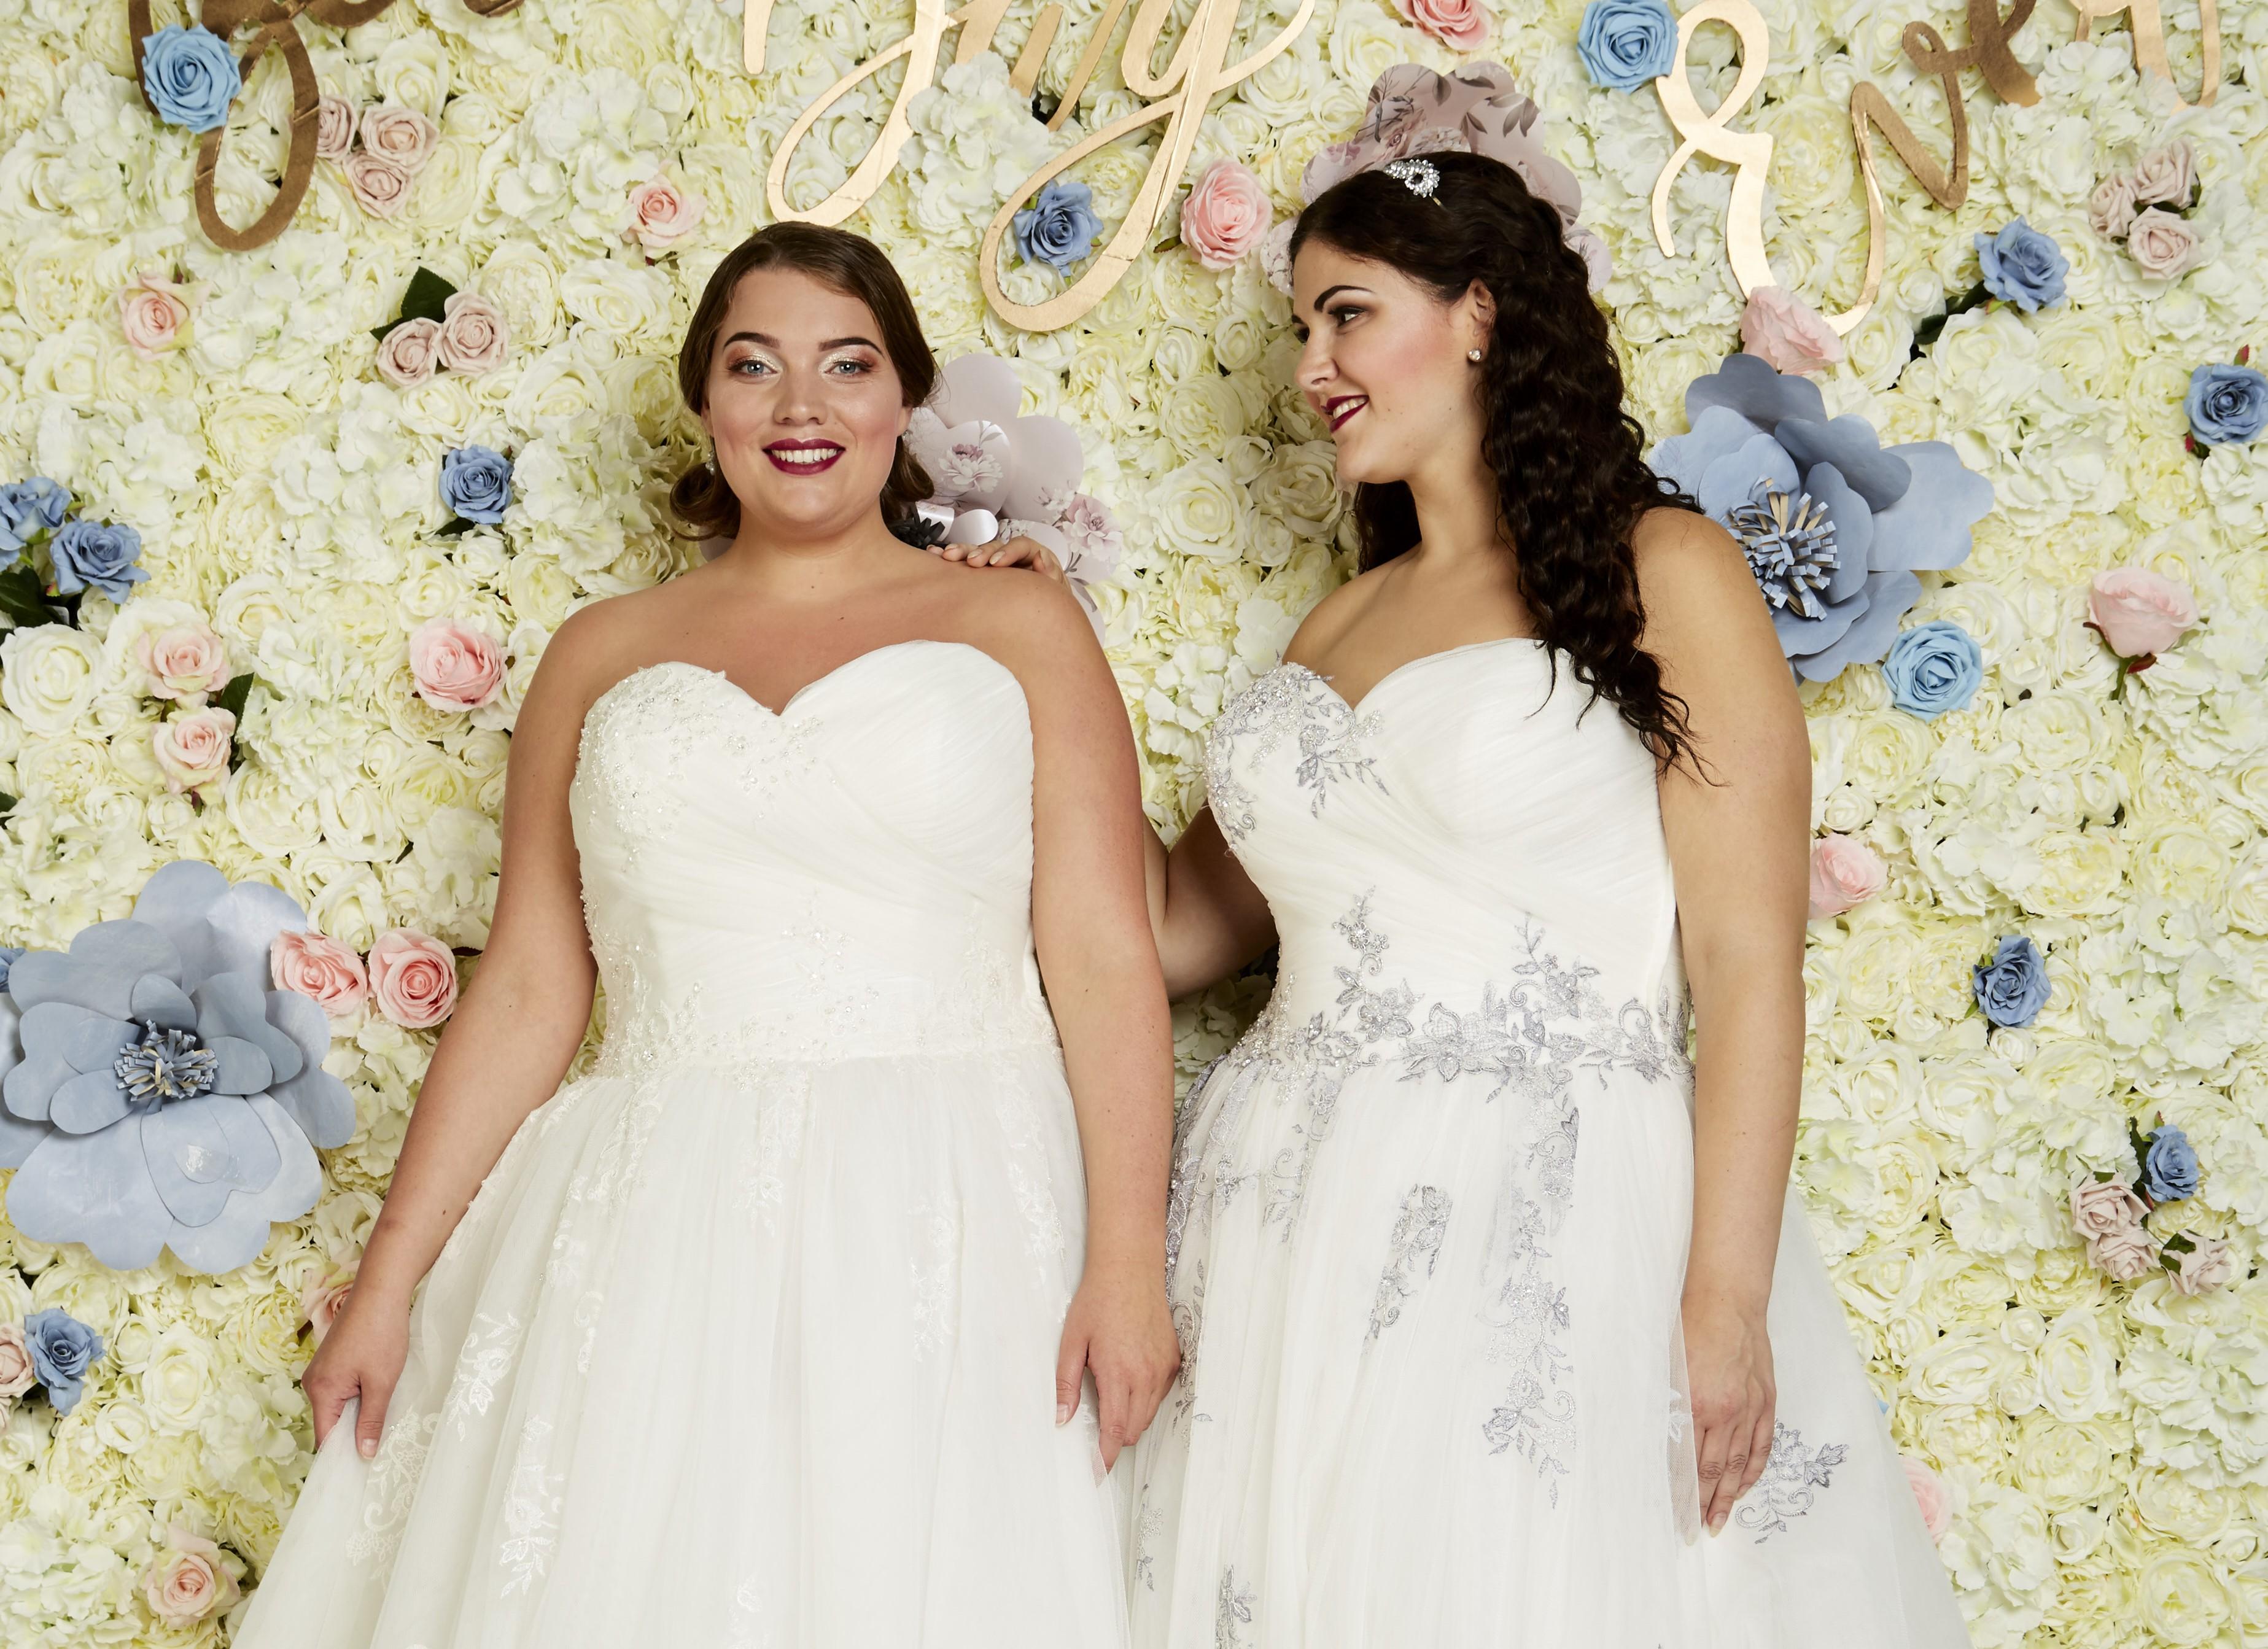 Theme your day... Sundae best - Love Our Wedding